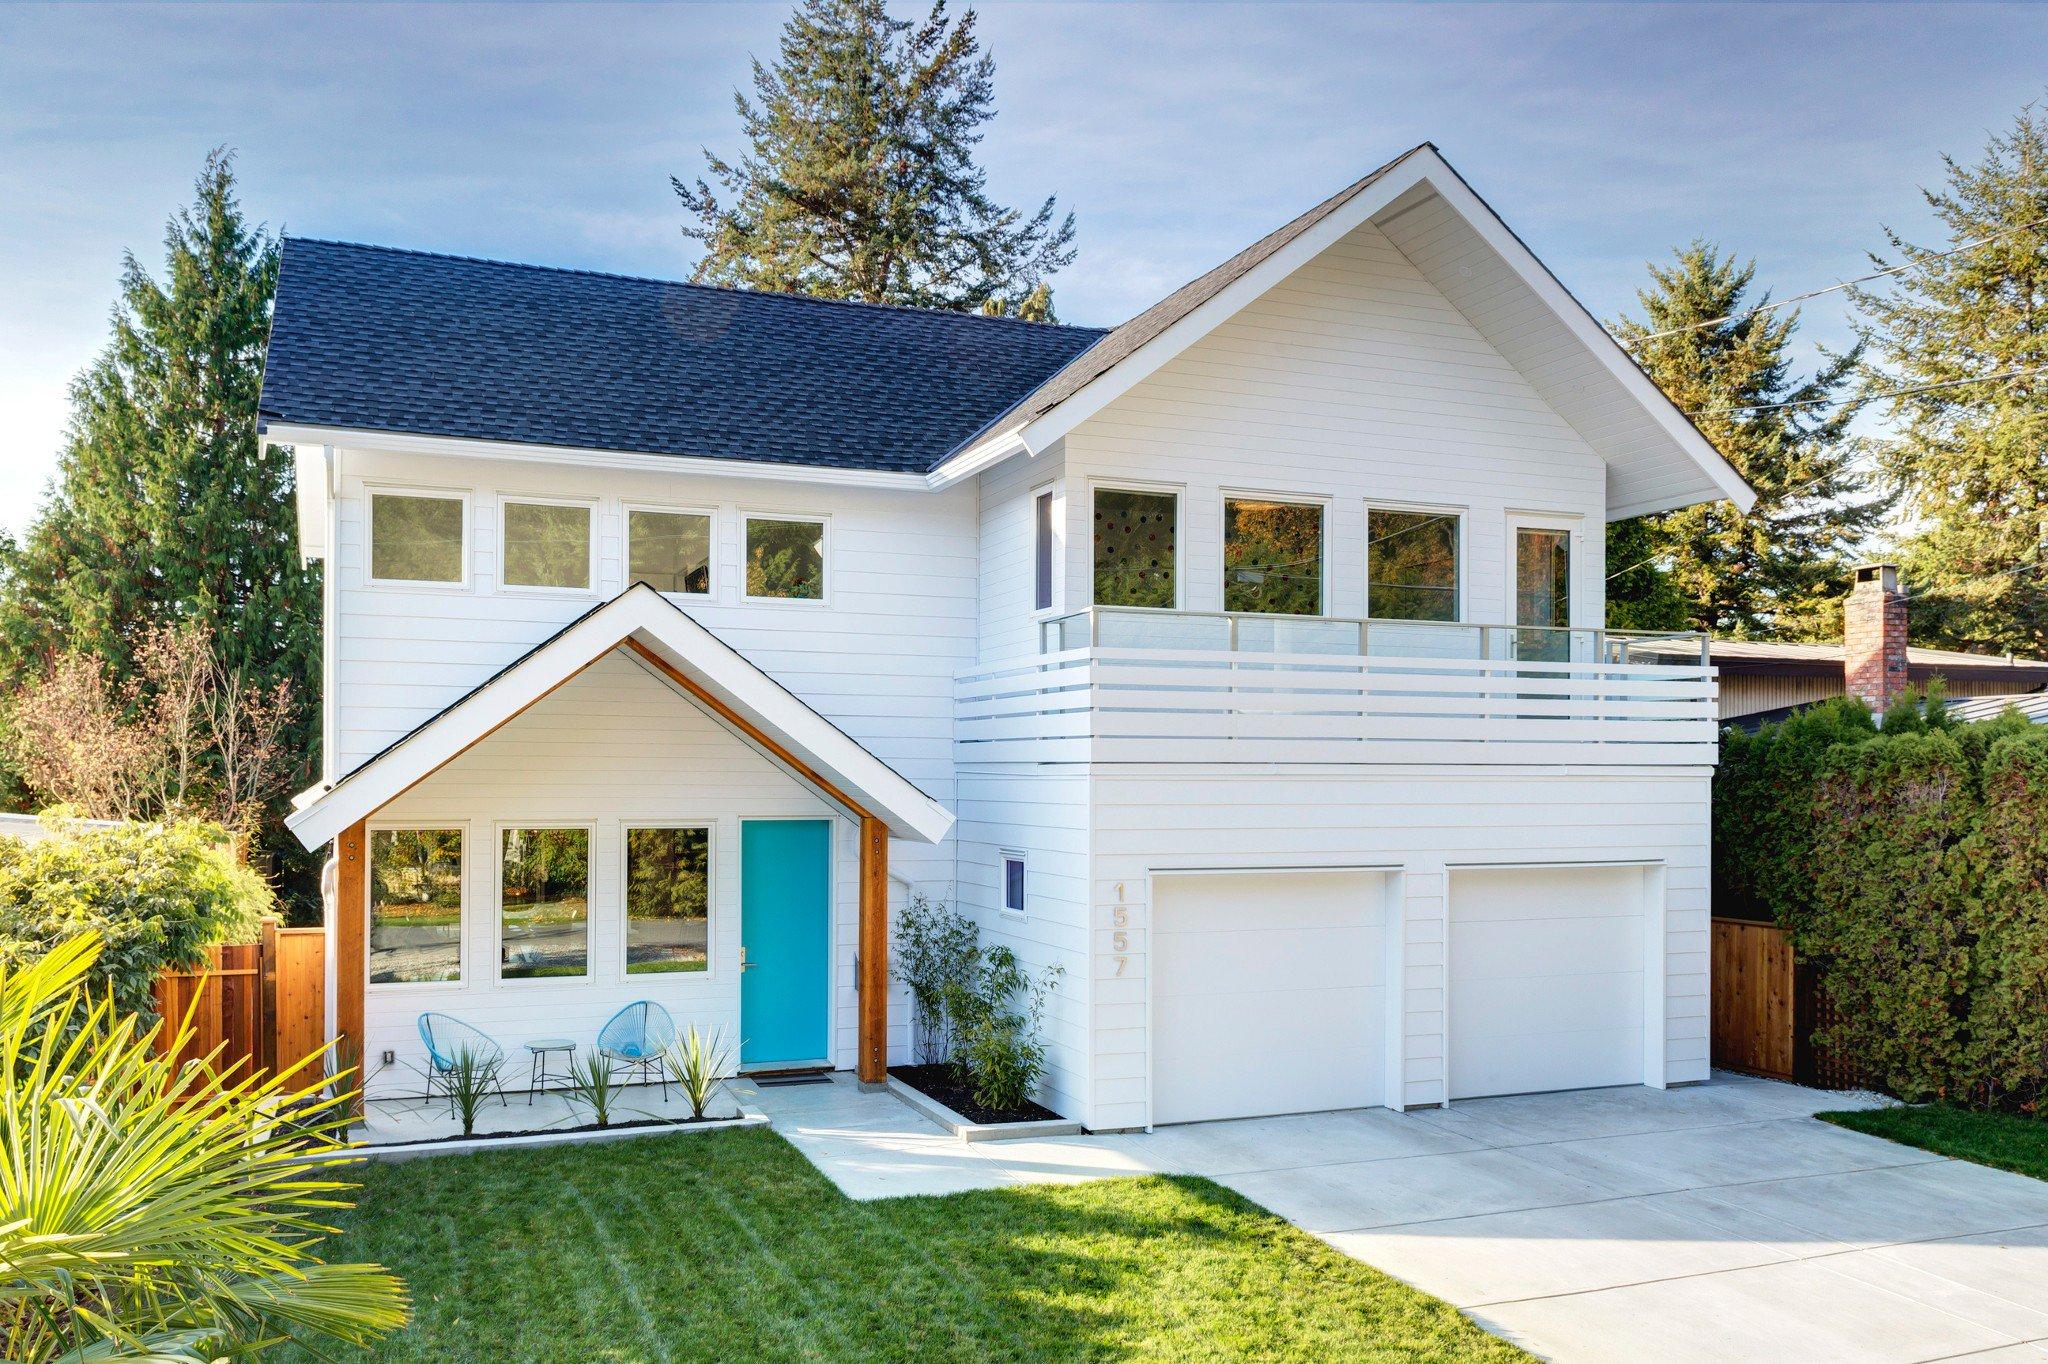 "Main Photo: 1557 FARRELL Avenue in Delta: Beach Grove House for sale in ""BEACH GROVE"" (Tsawwassen)  : MLS®# R2235636"